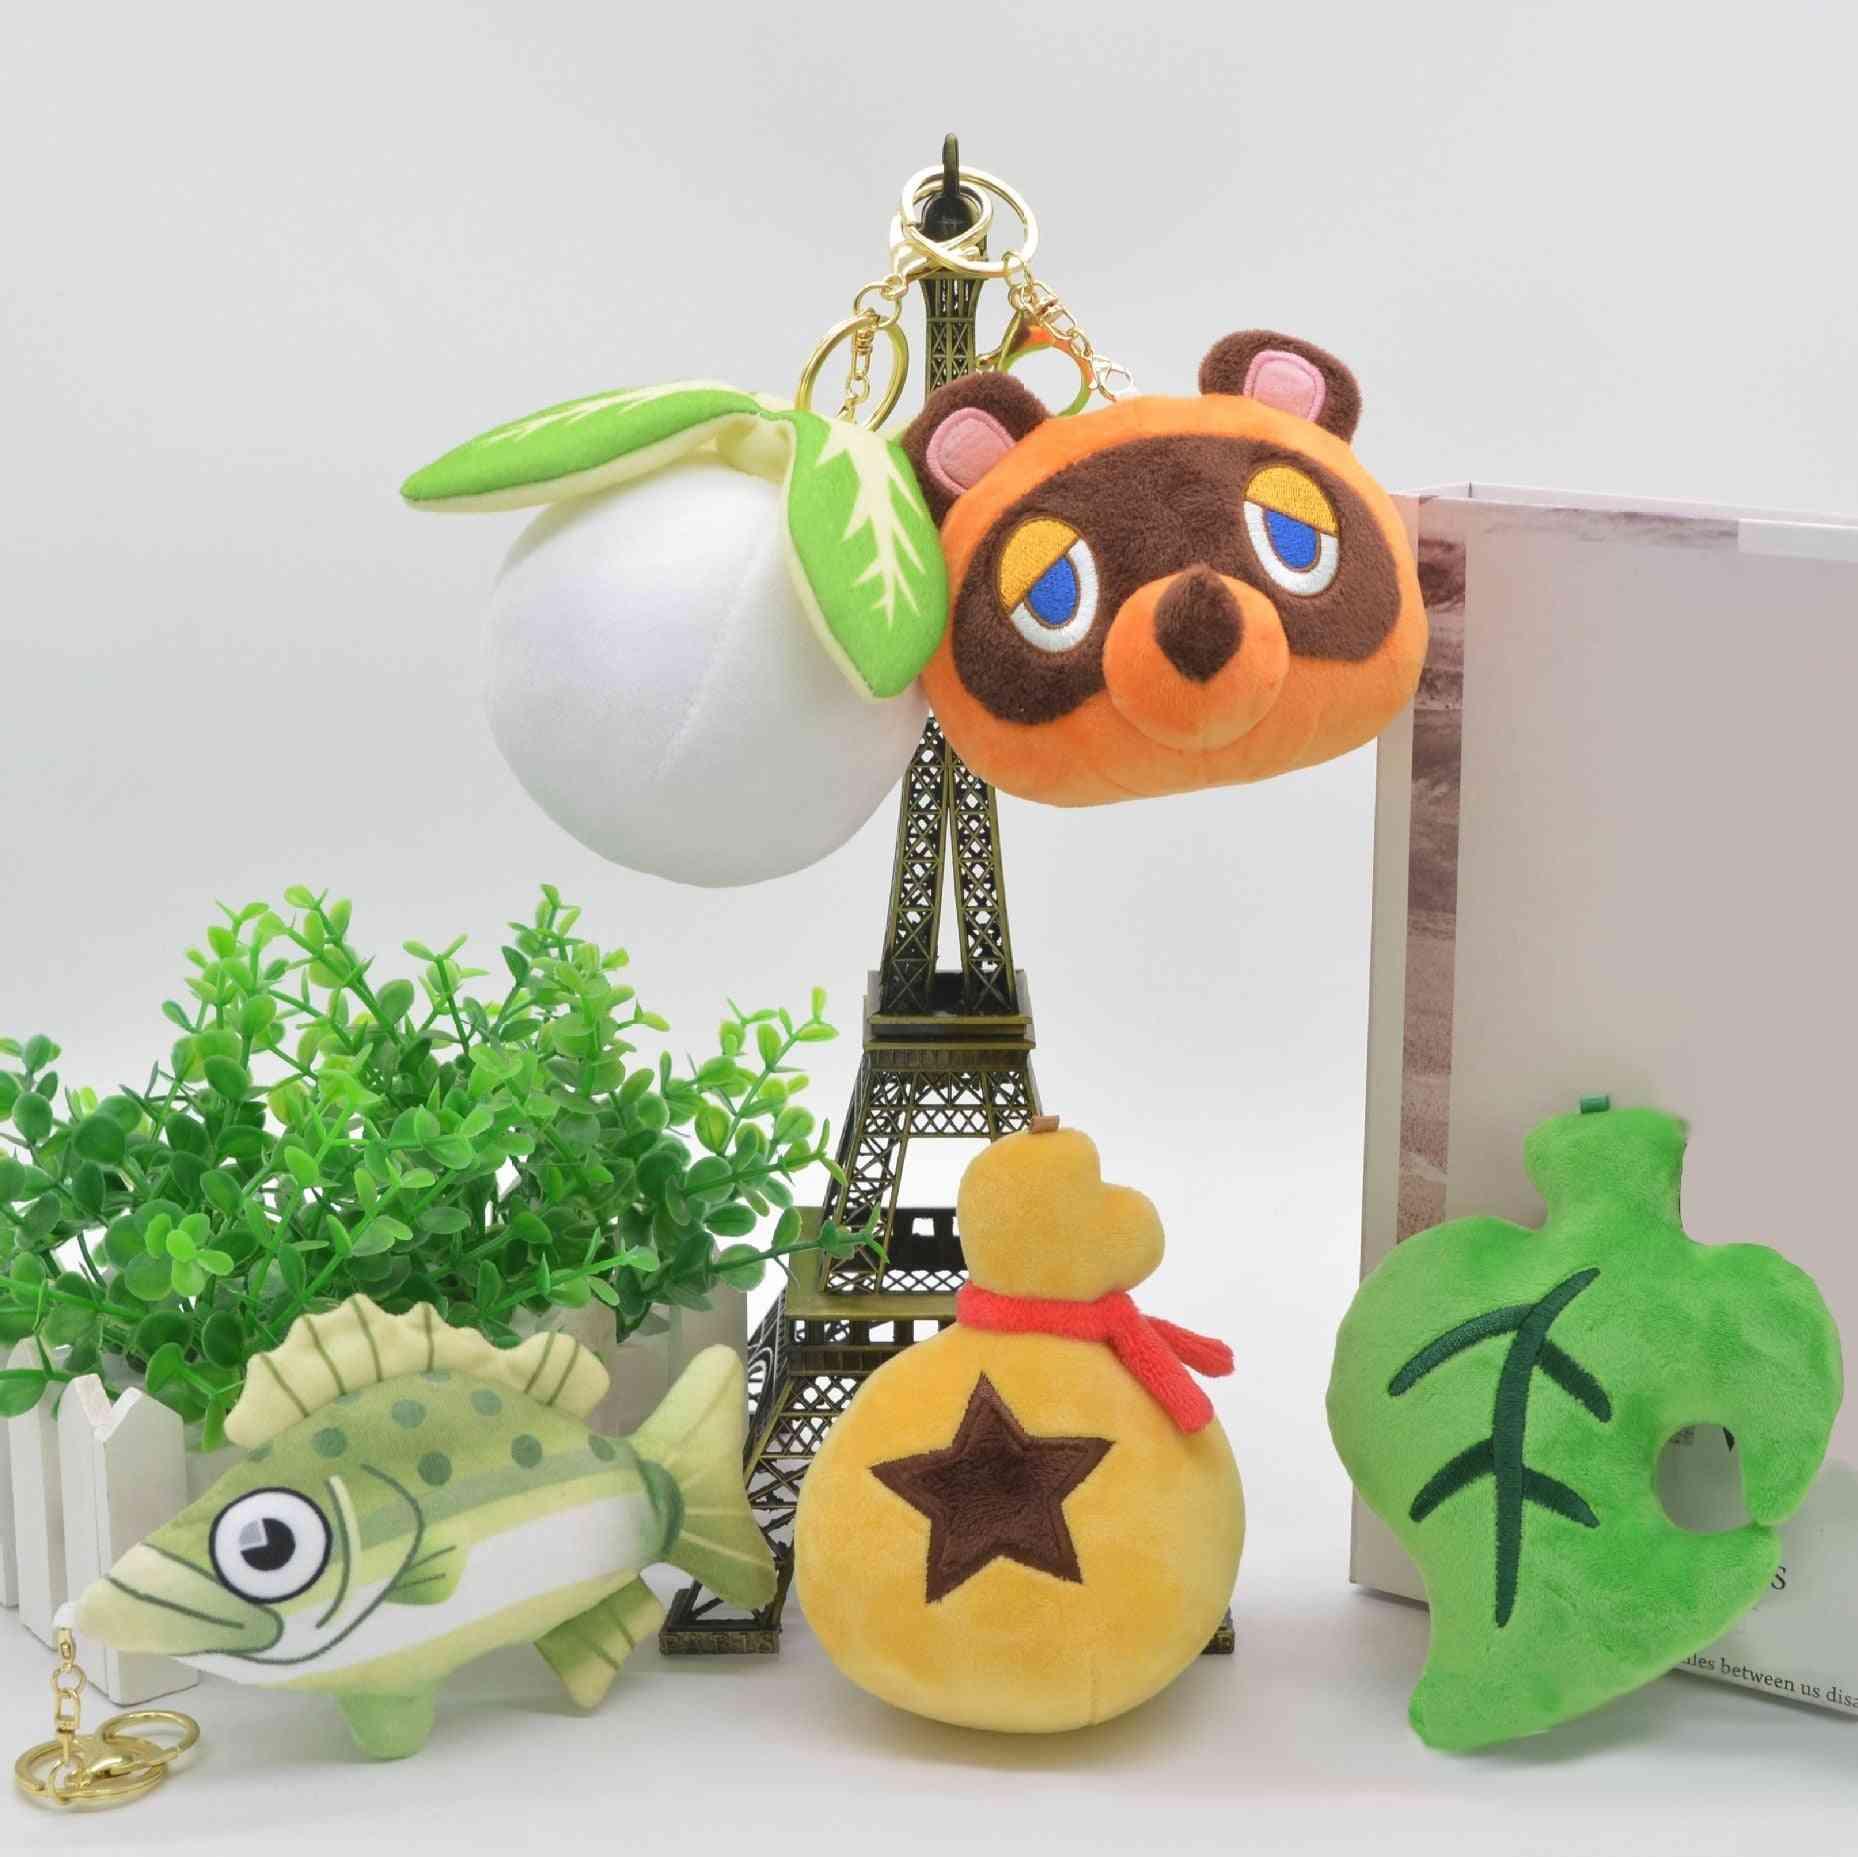 Cute Doll Animals Plush For Kids